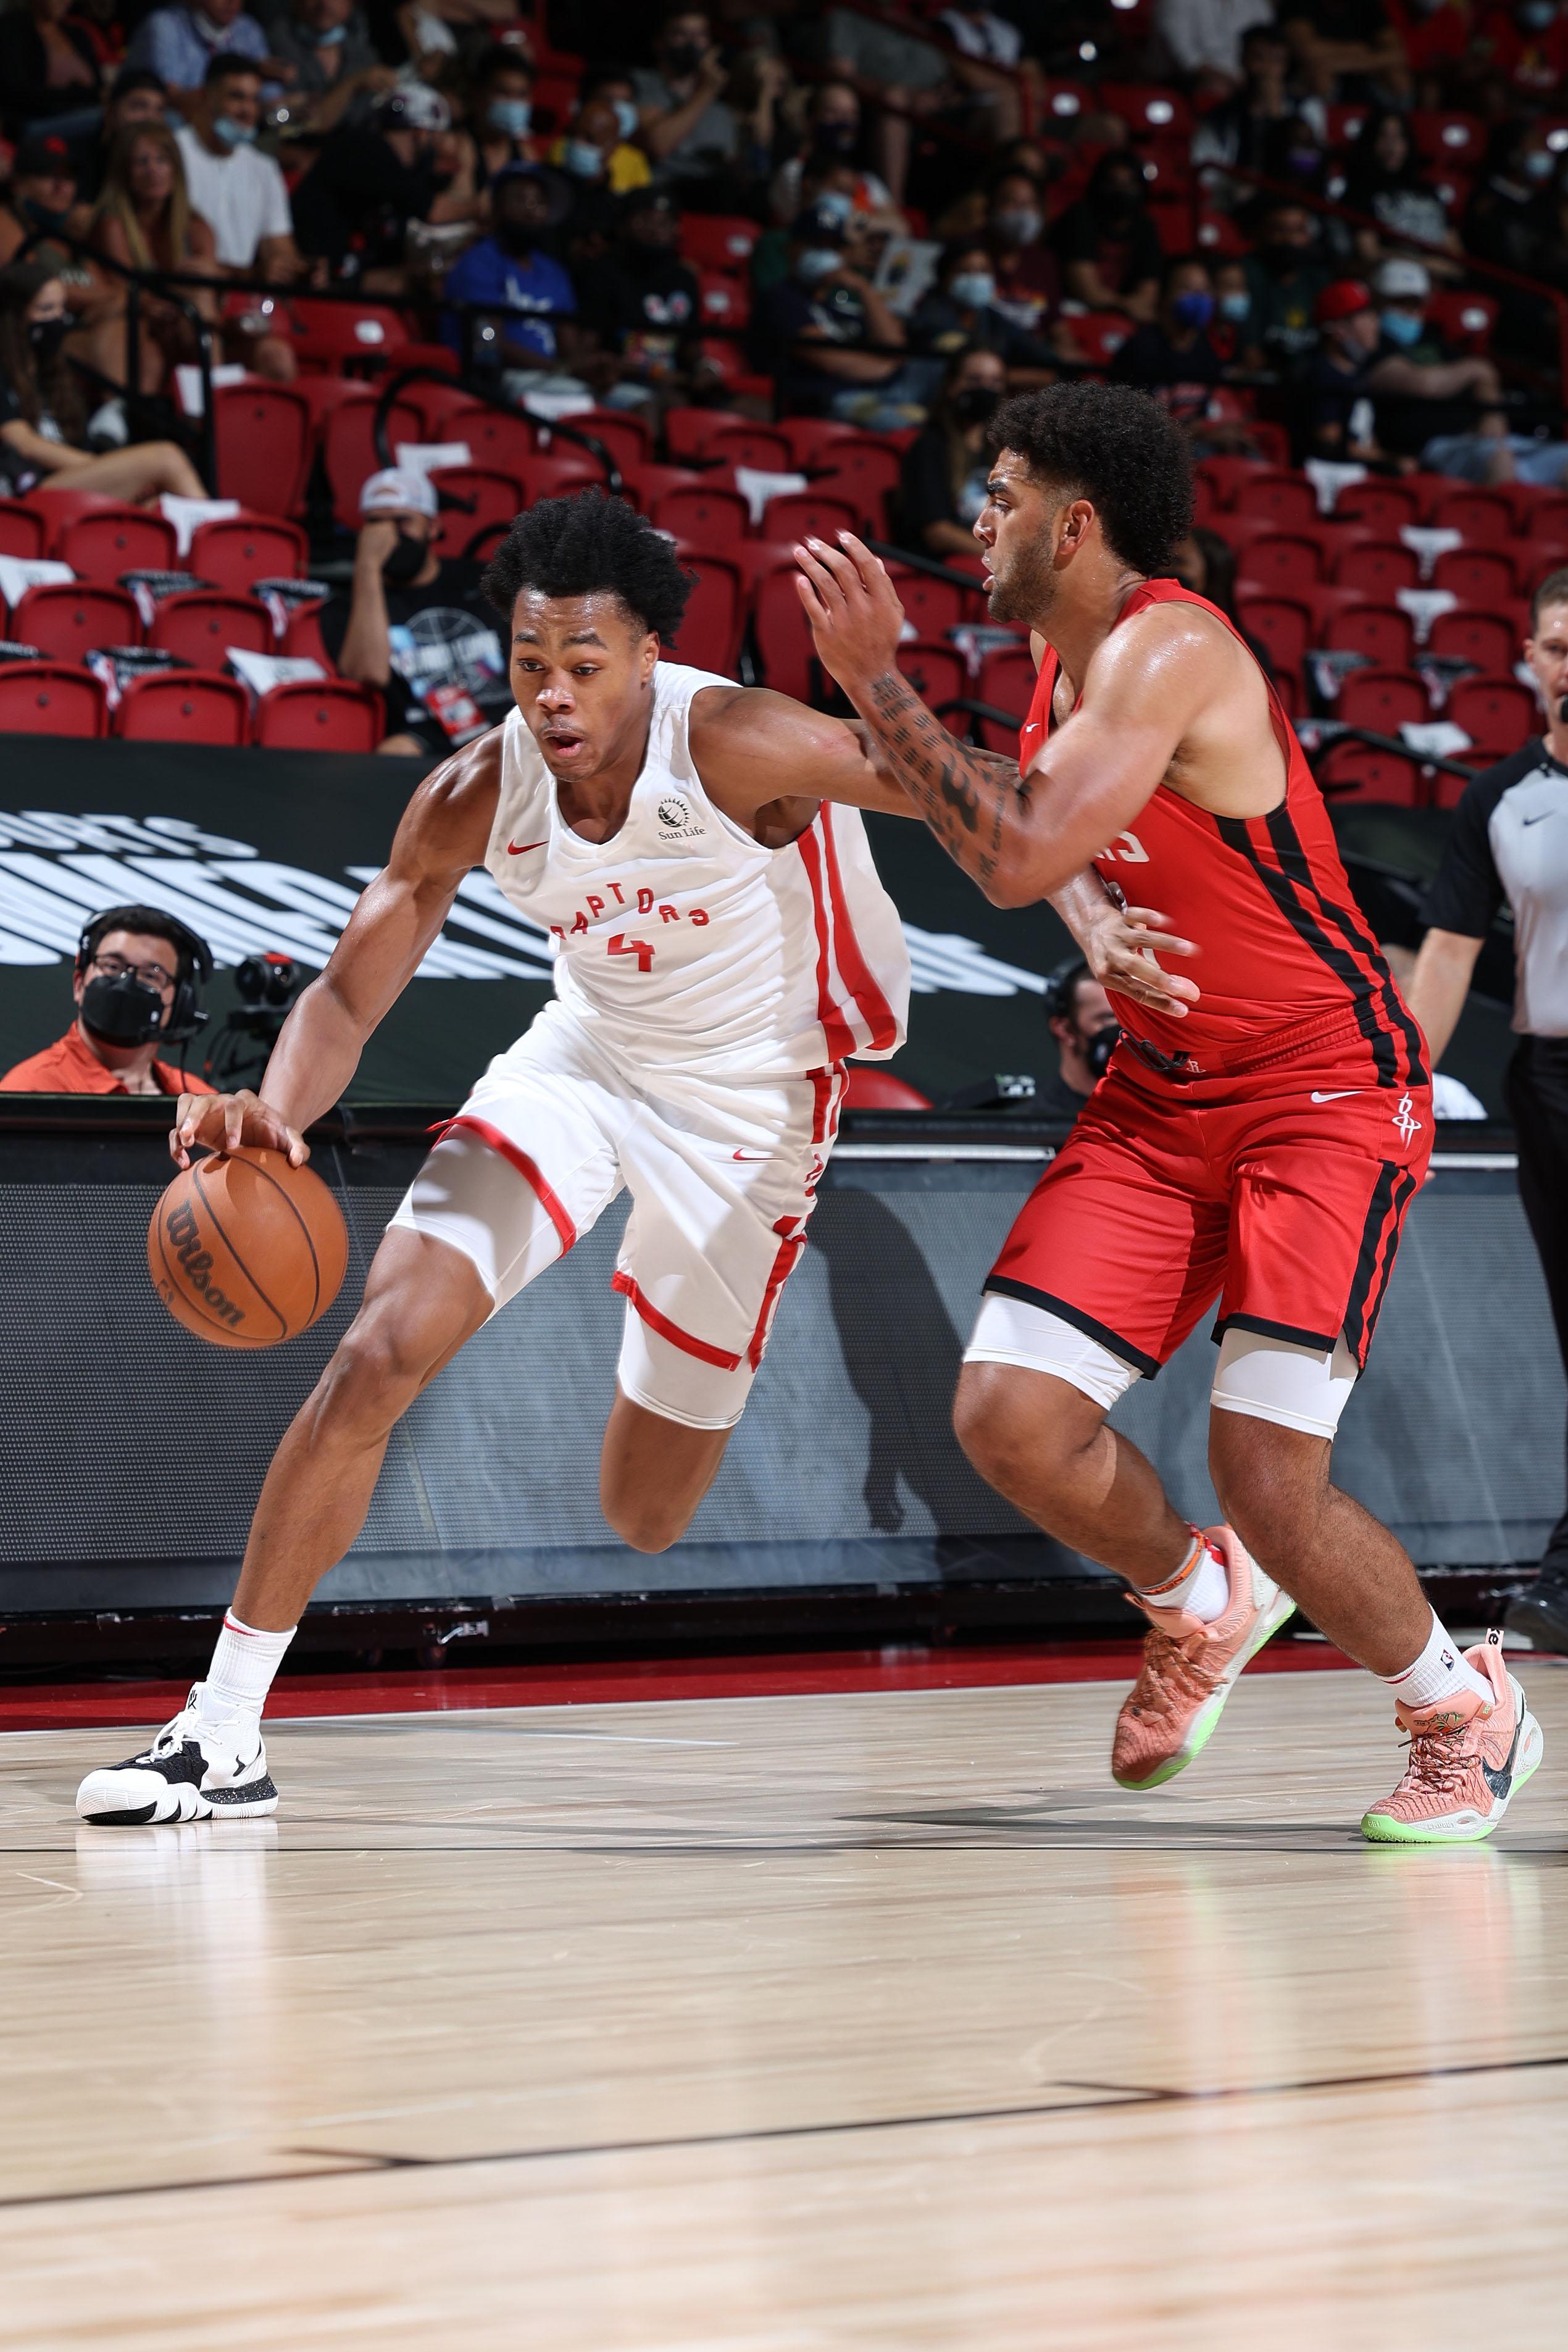 2021 Las Vegas Summer League - Houston Rockets v Toronto Raptors